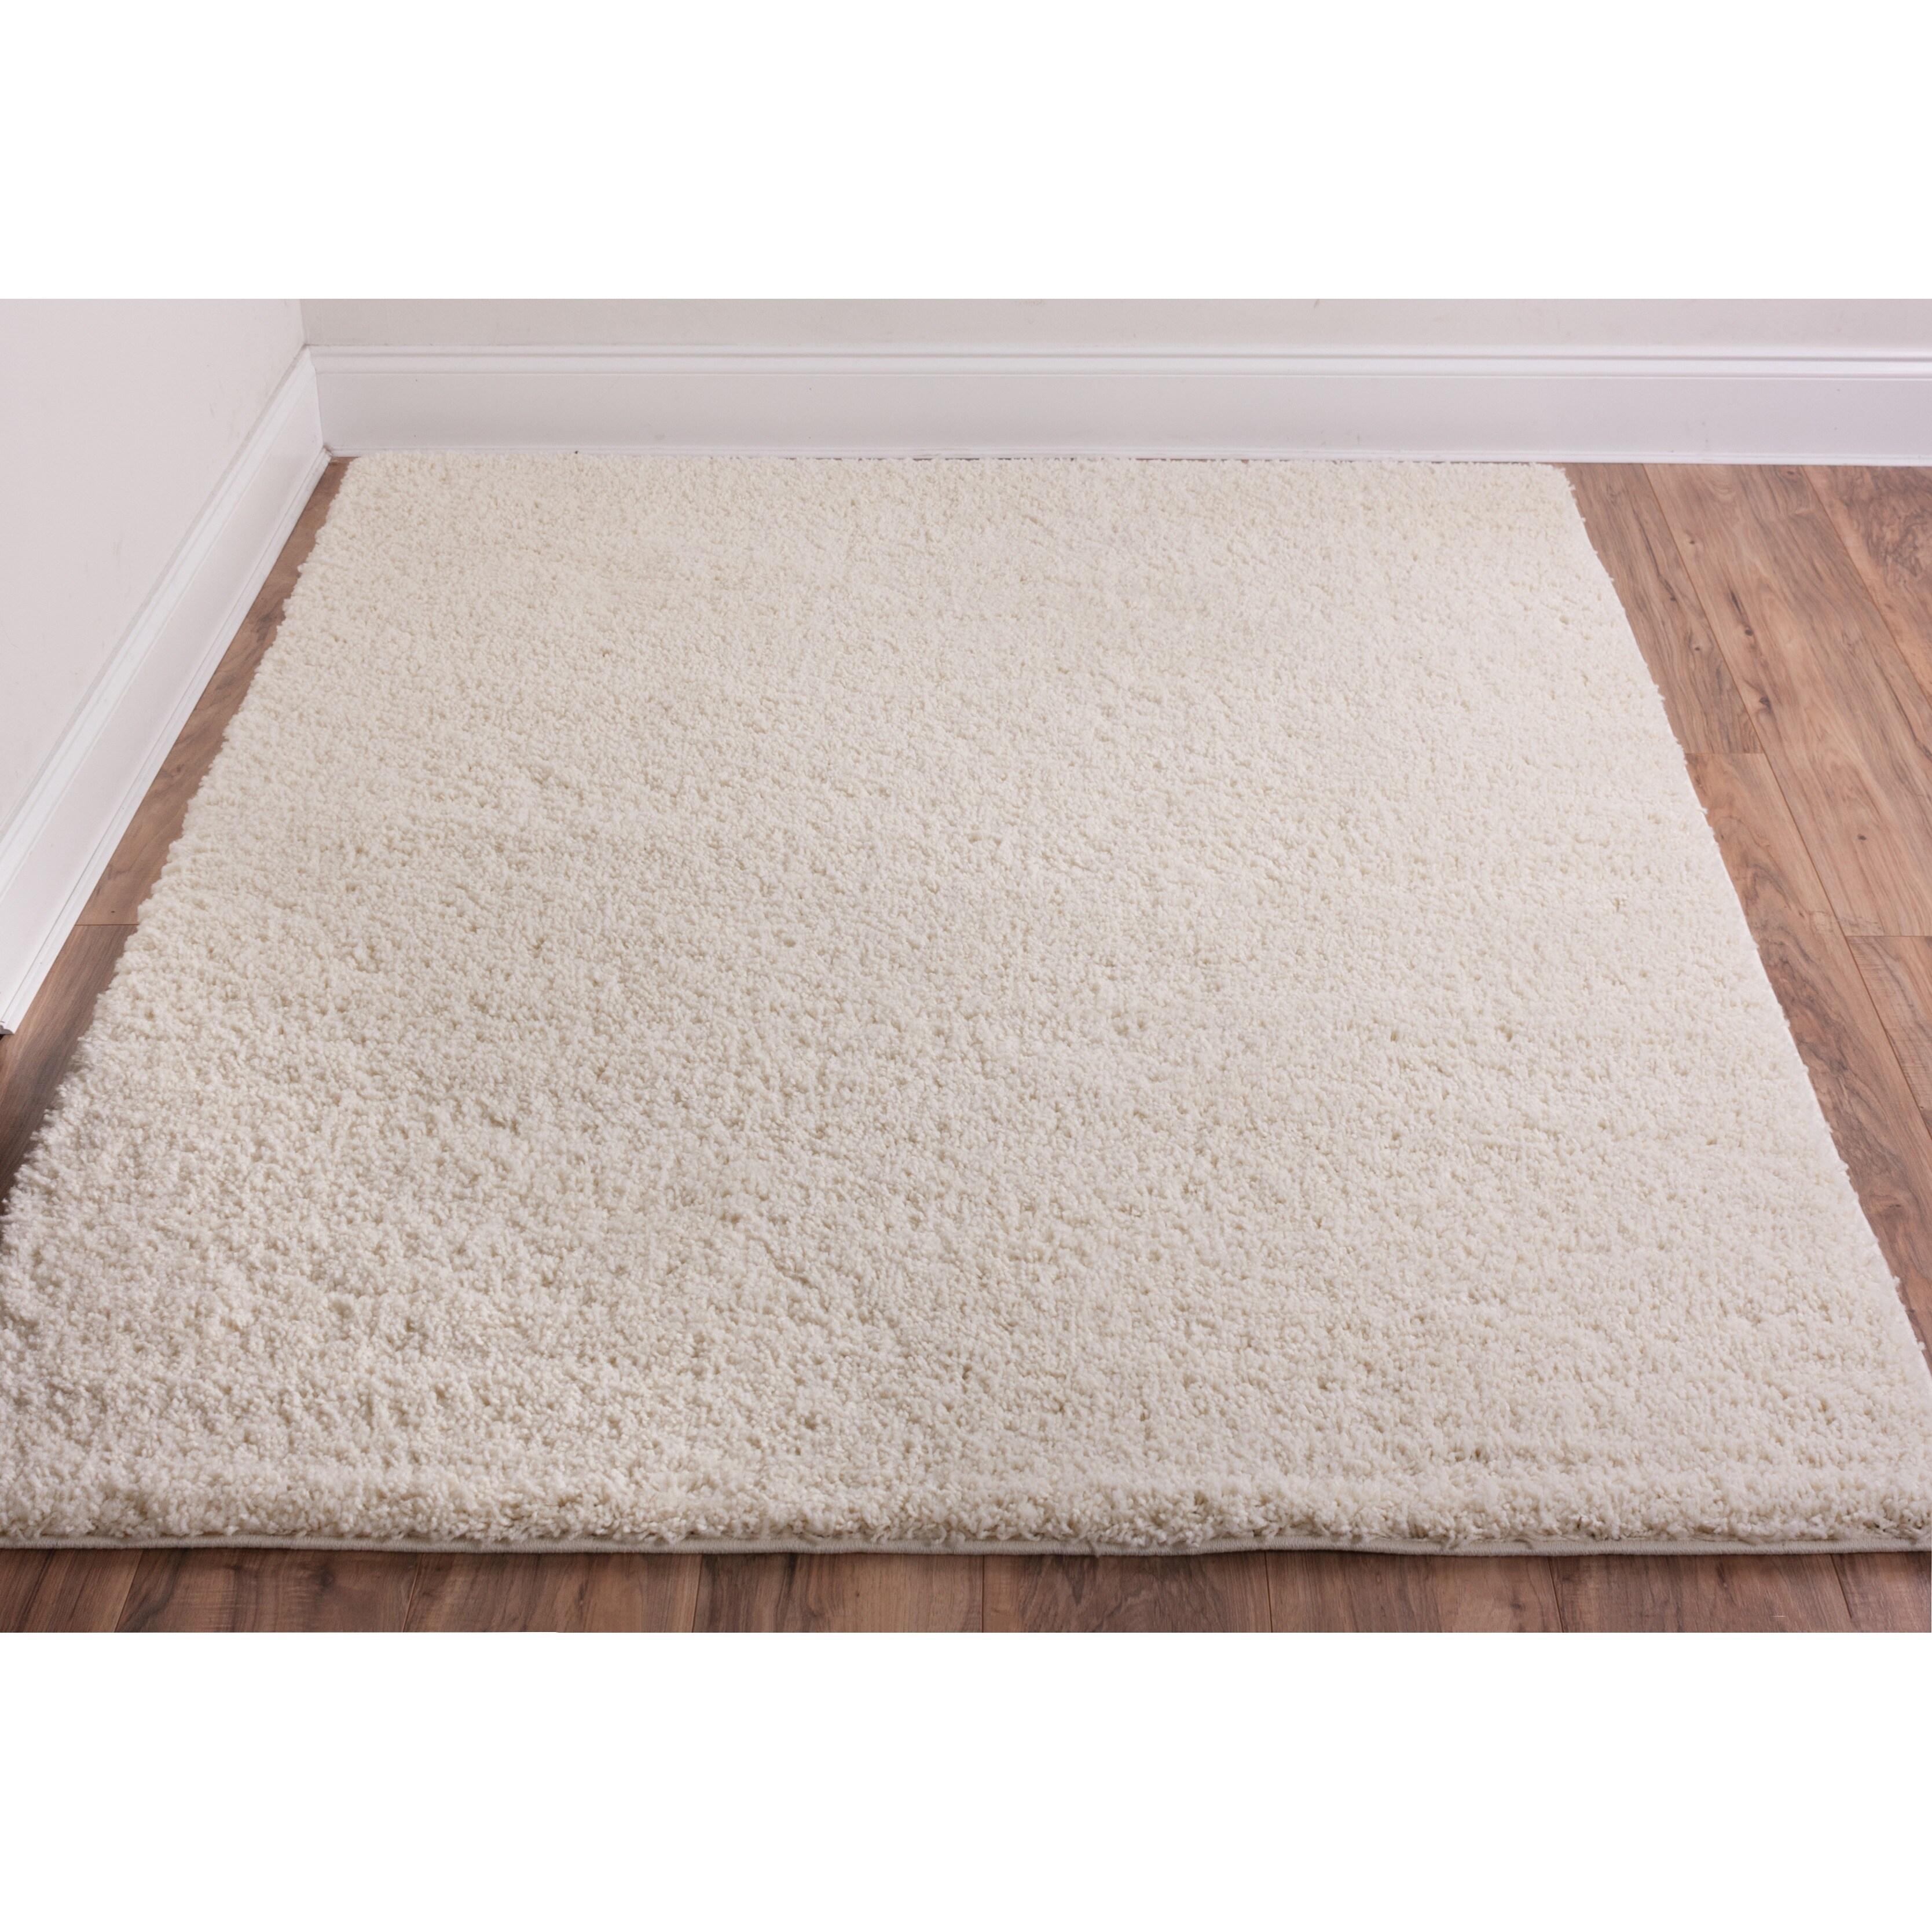 Infinity Home Source Shag Plus Area Rug Plain Vanilla 3'3...